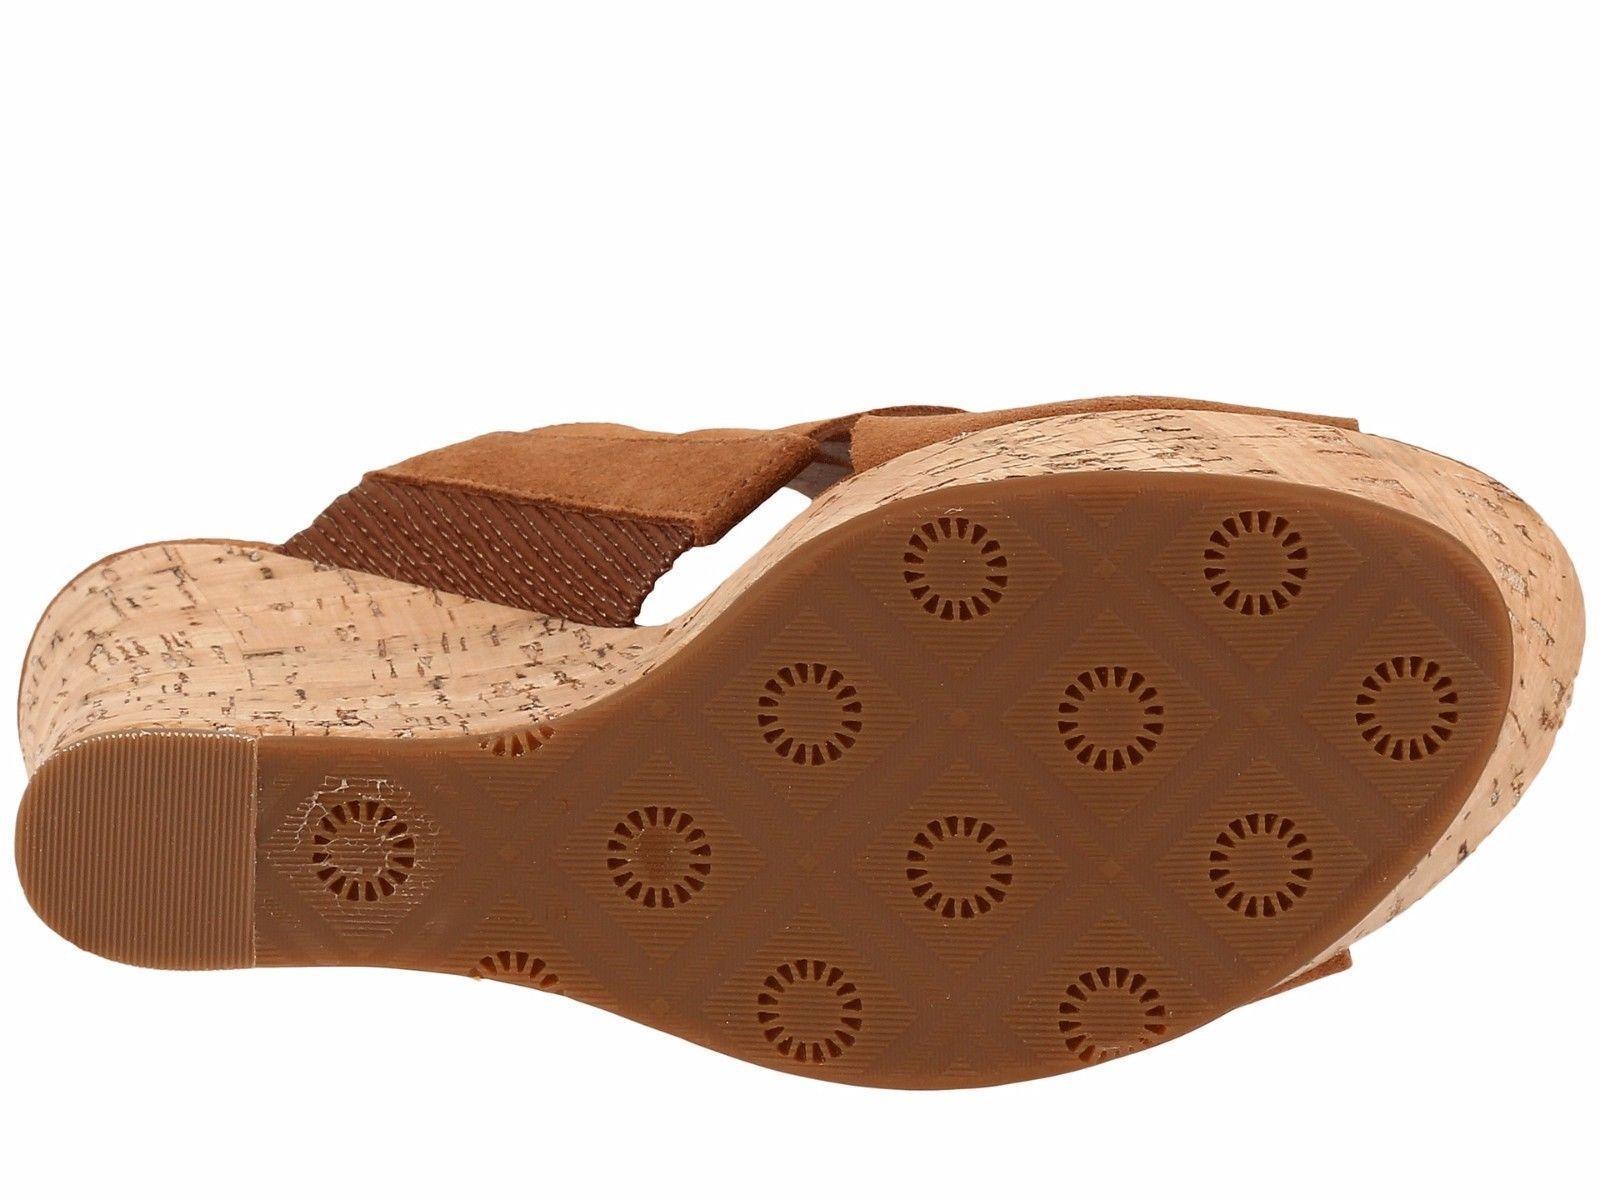 UGG Marta High Wedge Sandals Chestnut 12